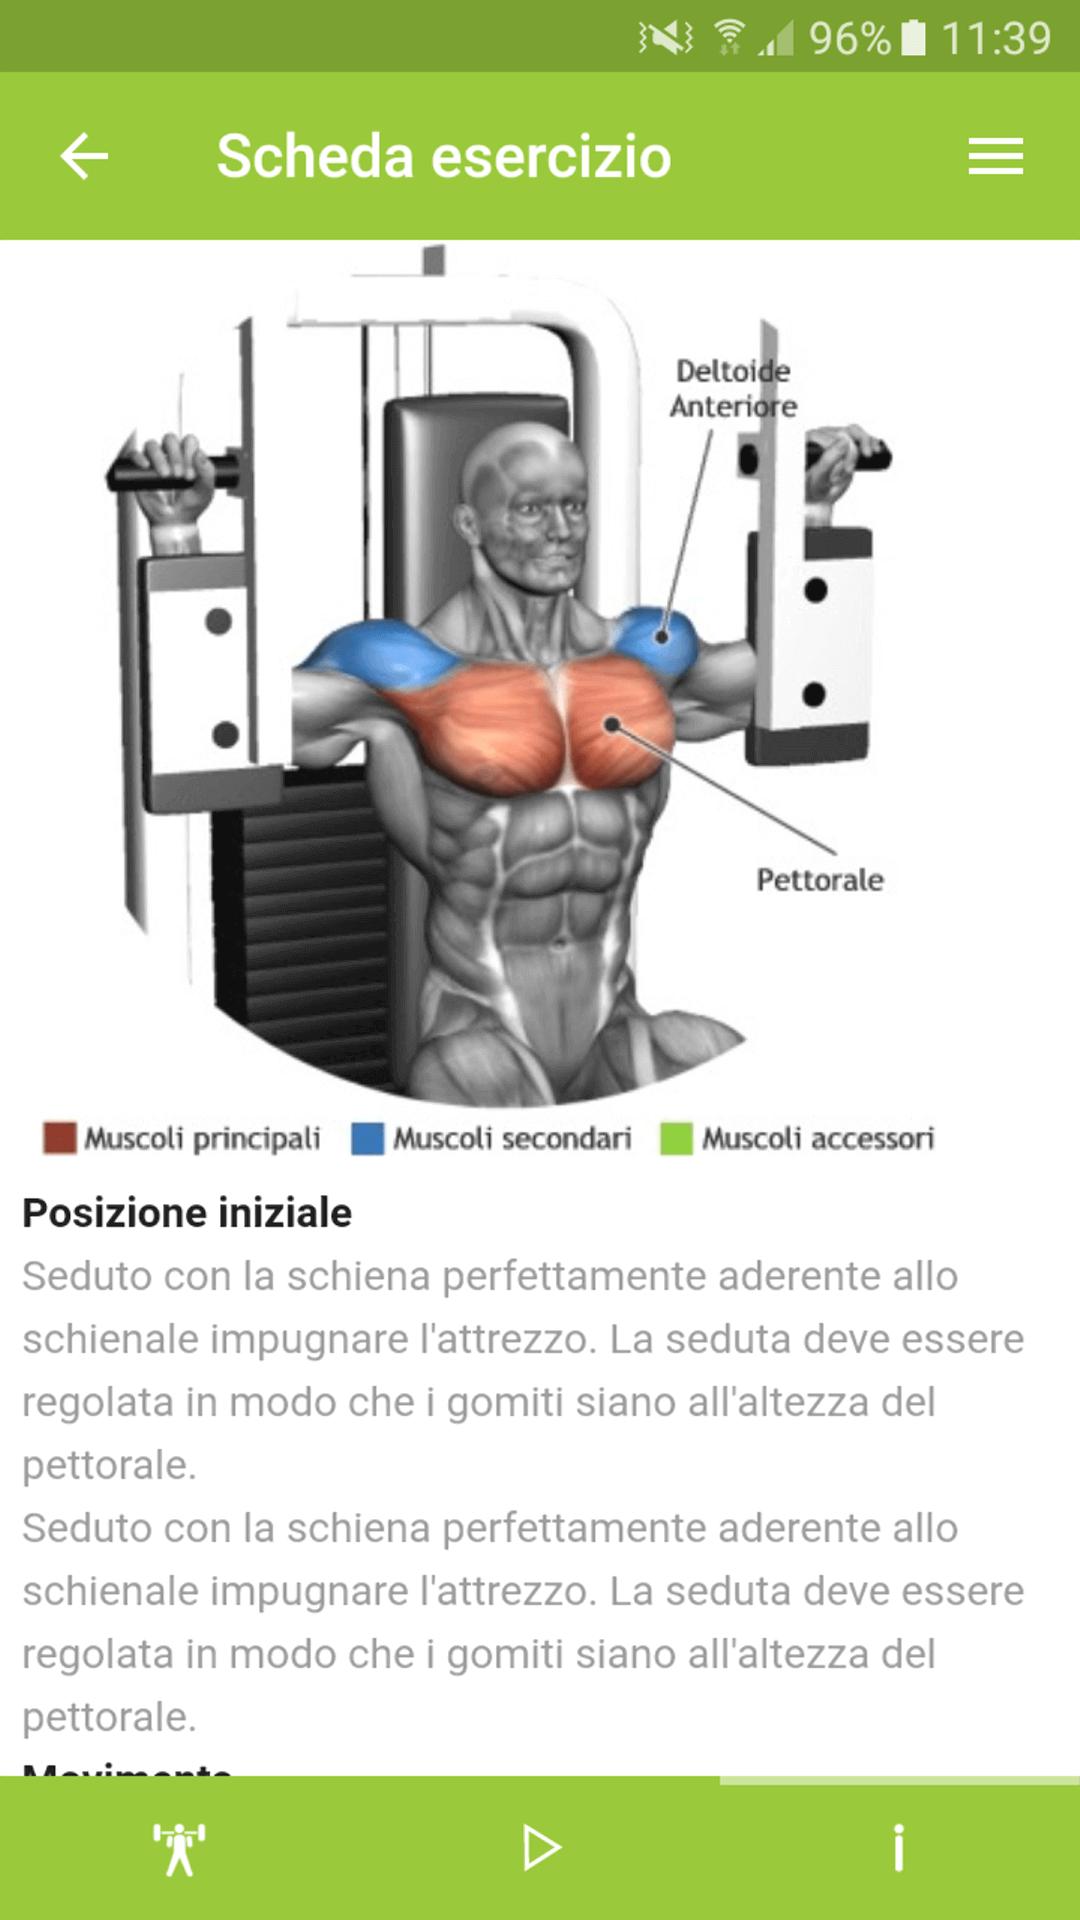 Screenshot istruzioni esercizio app